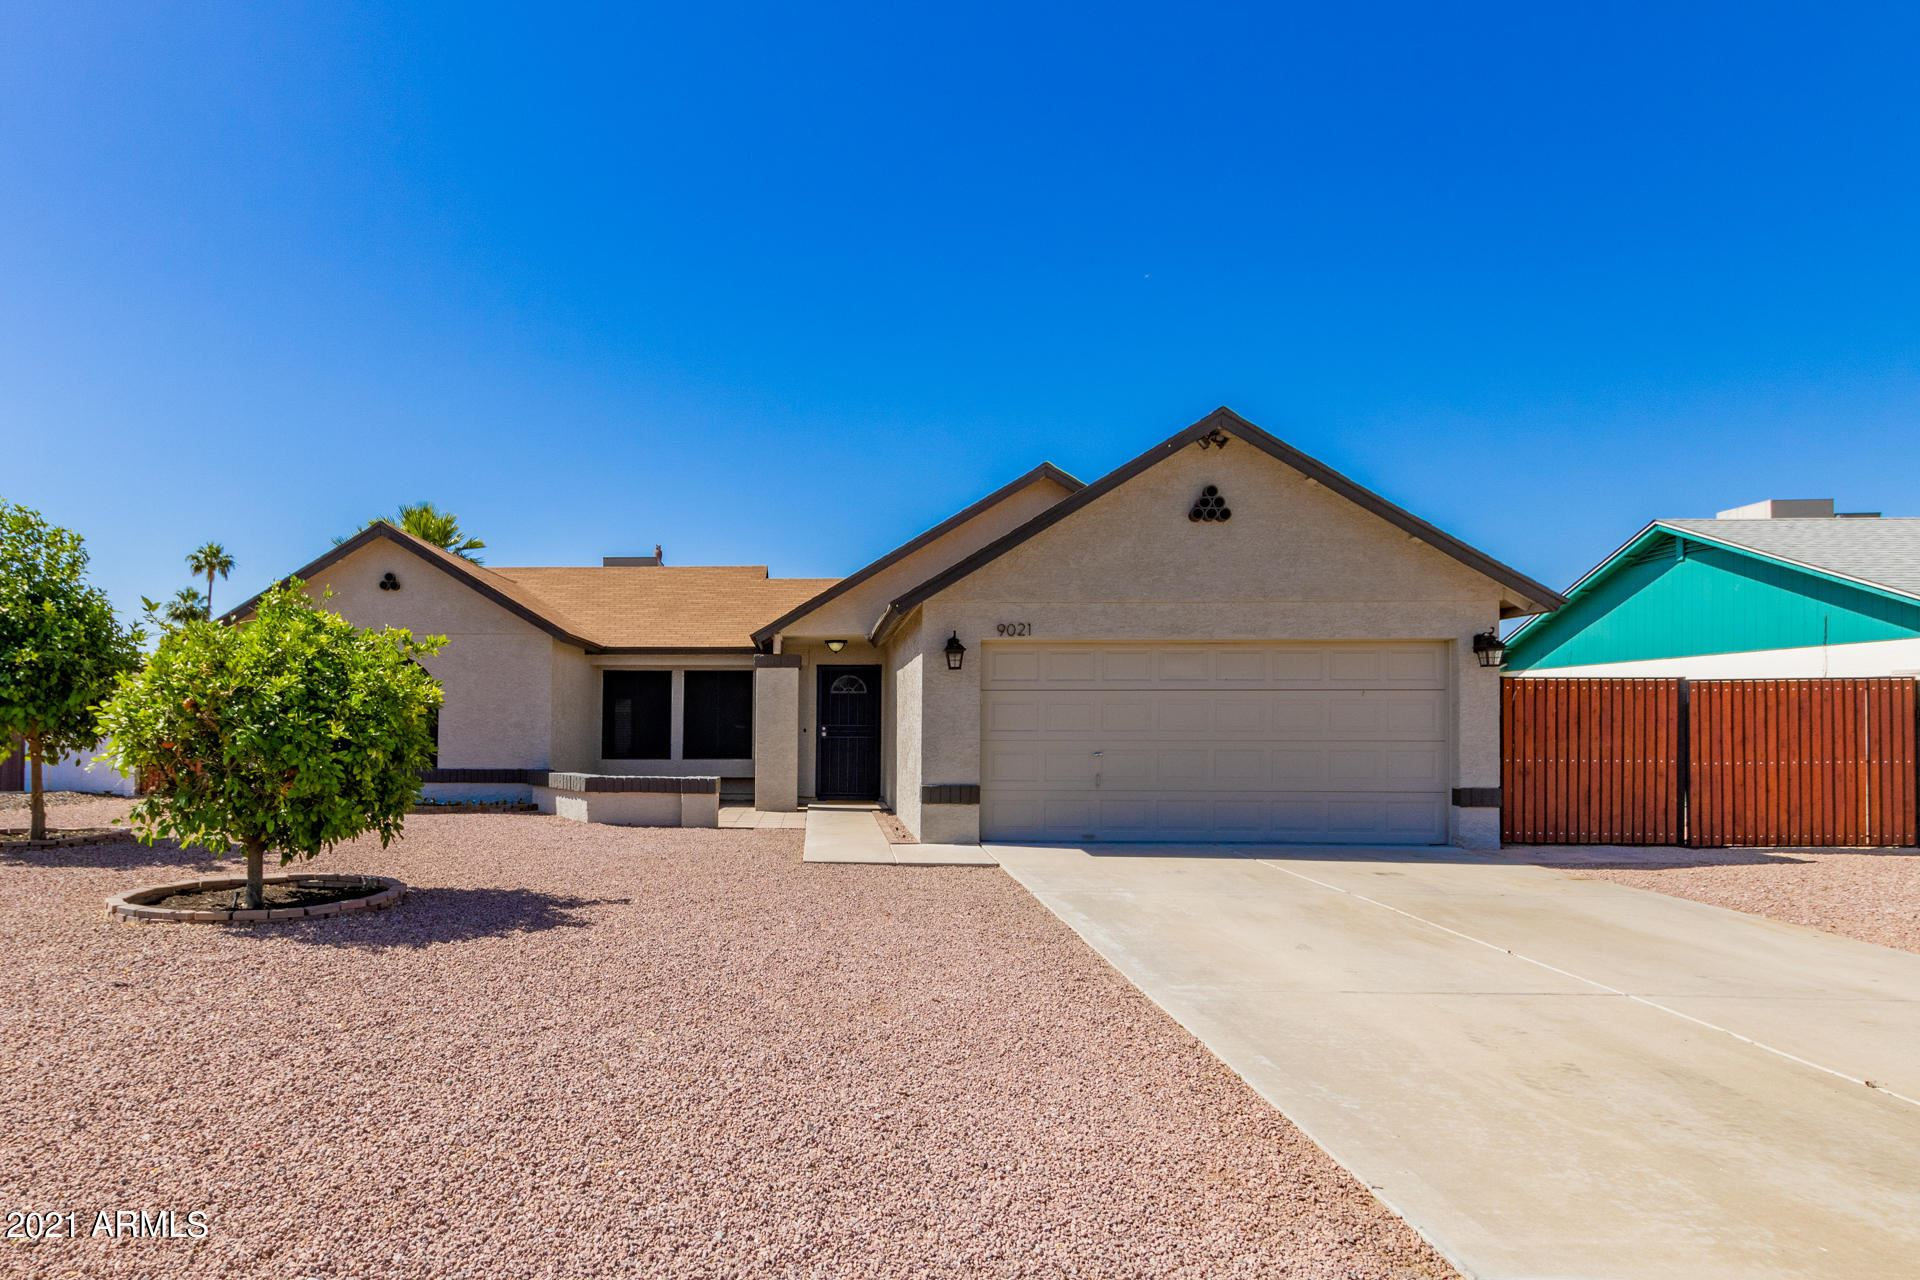 9021 W PURDUE Avenue, Peoria, AZ 85345 - MLS#: 6235655